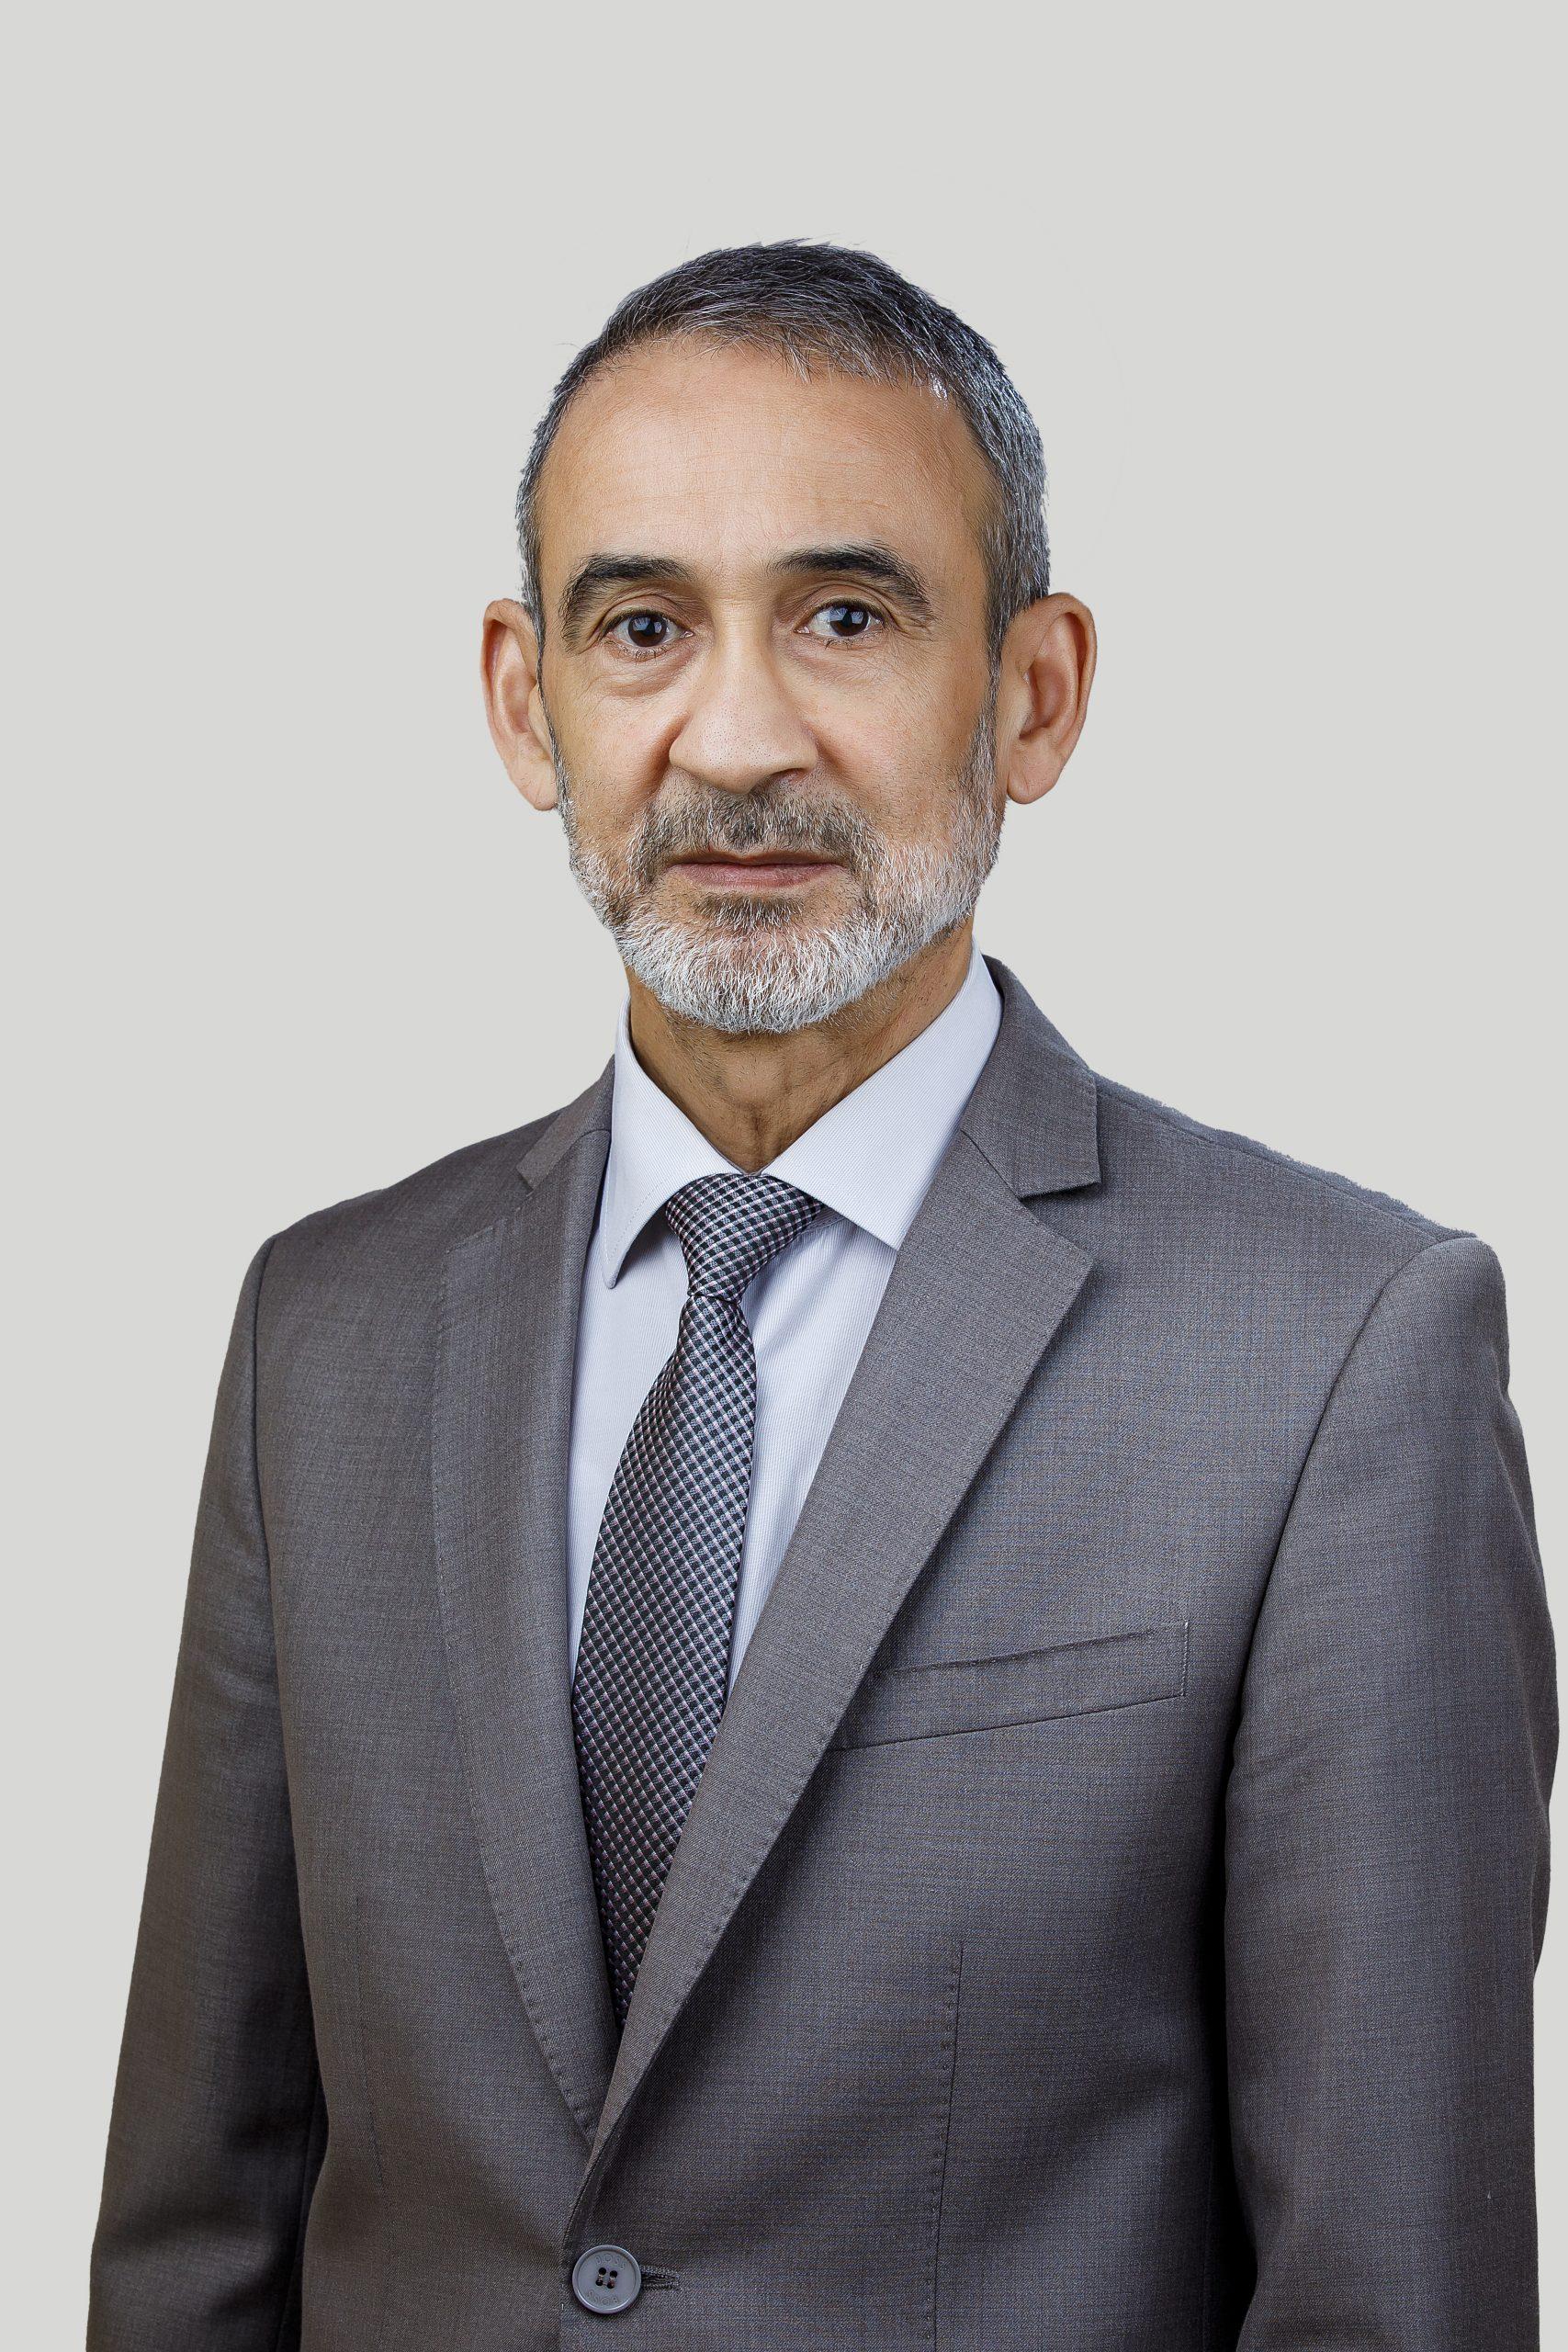 Prof. Dr. Idriss Boukraa